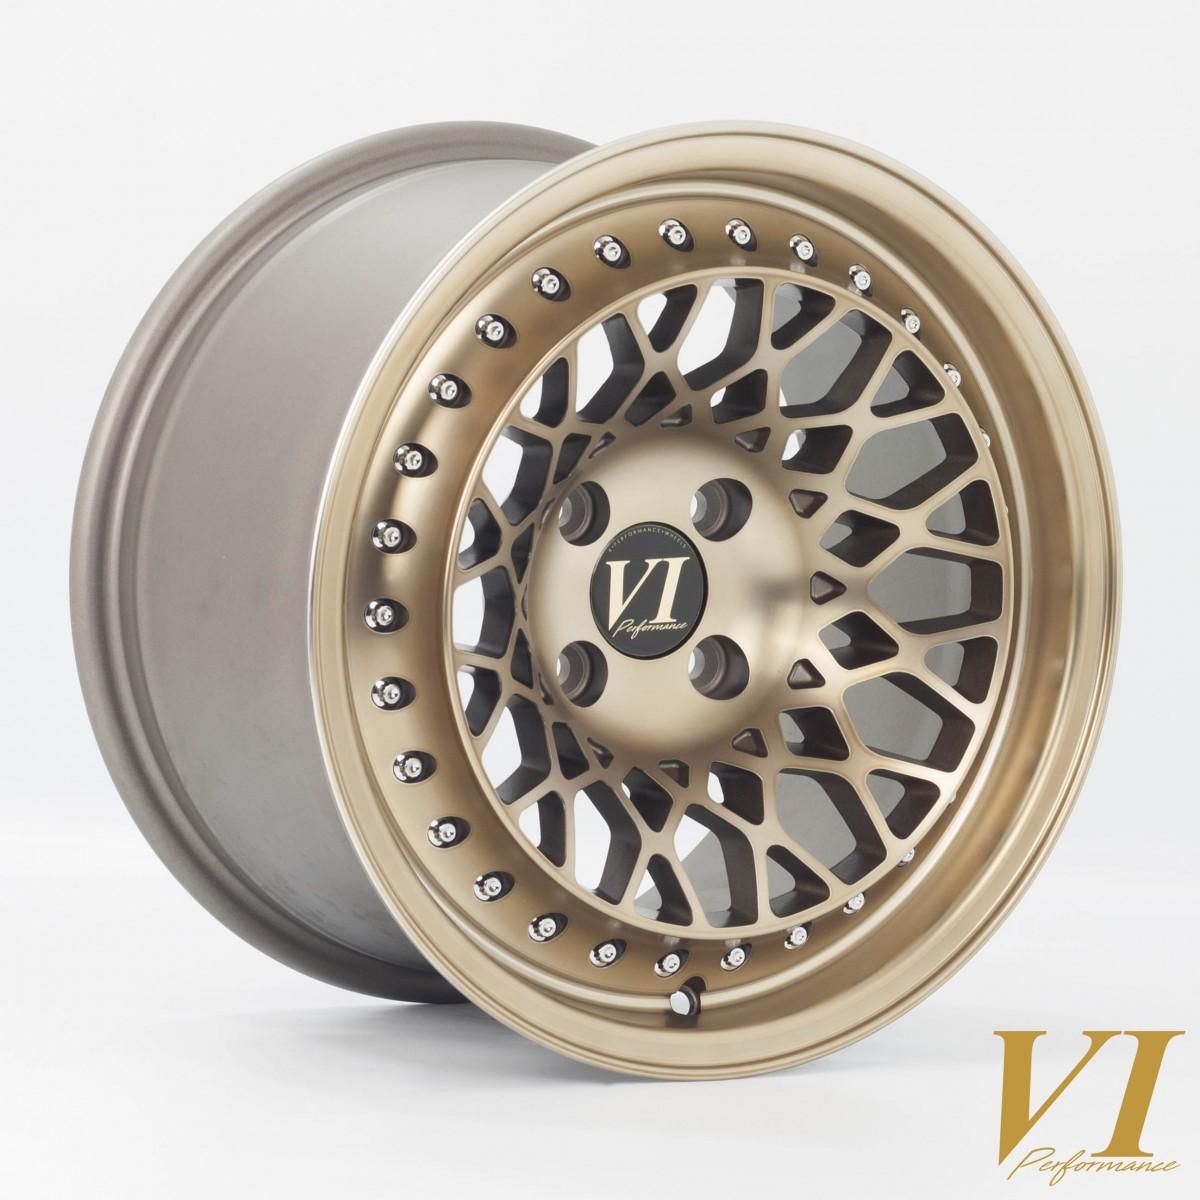 6Performance Infinity 15x8.25 4x100 ET15 Gold